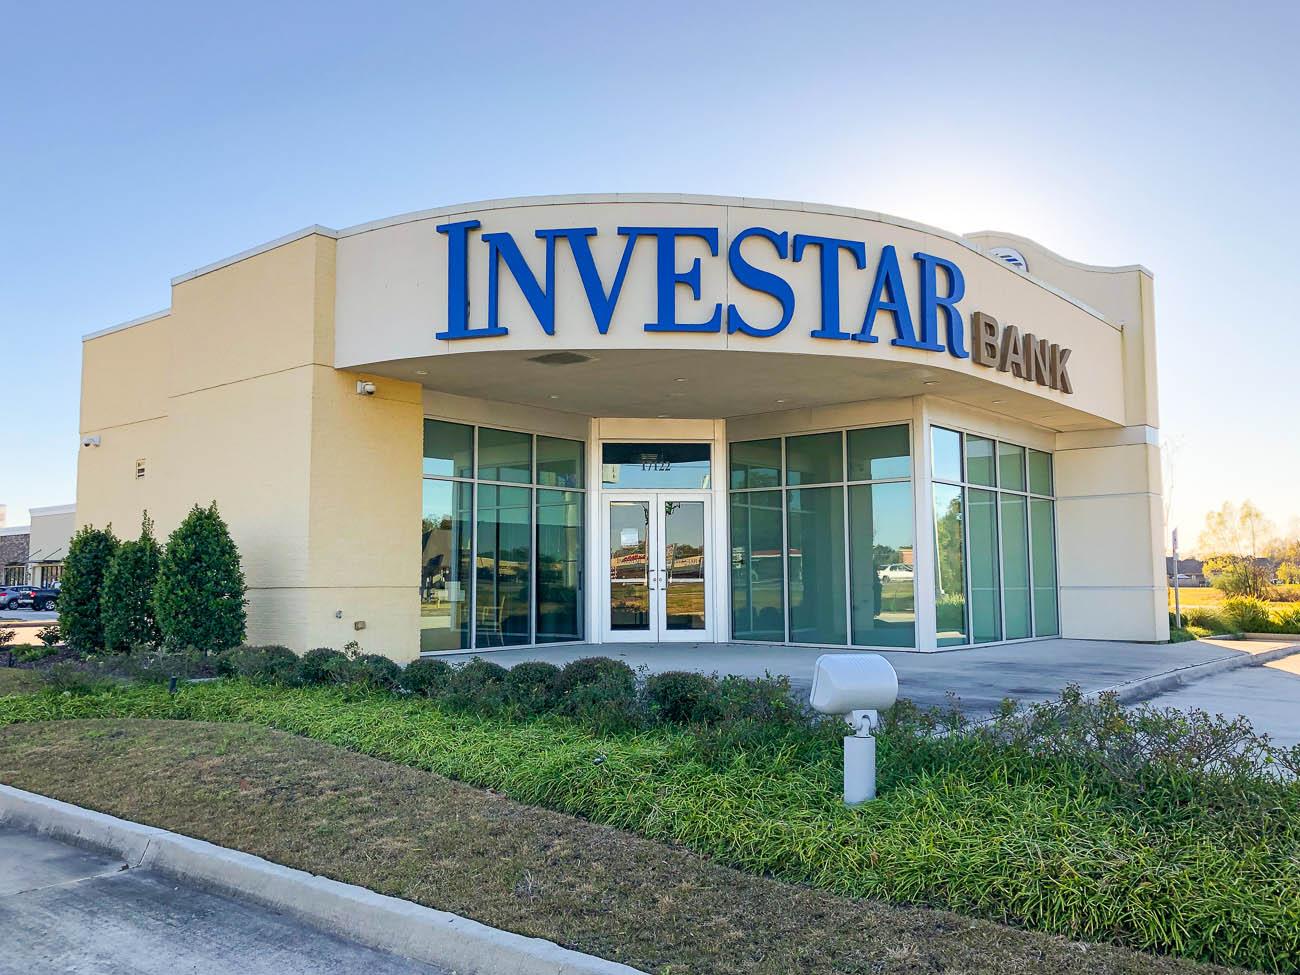 investar bank metairie la